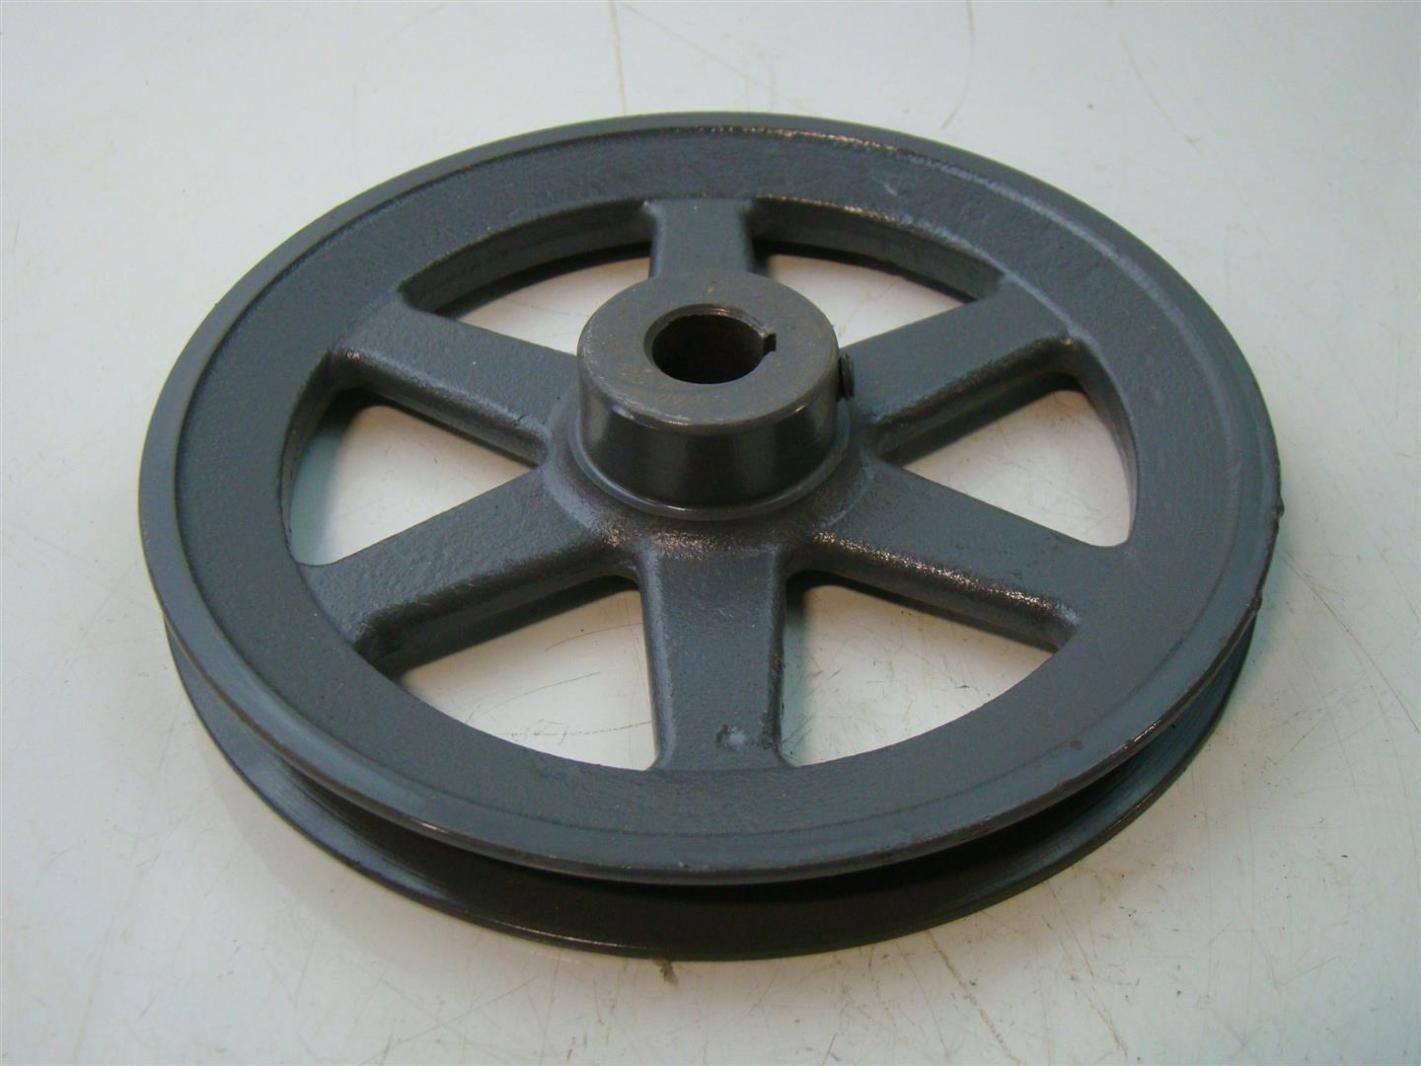 browning 1 grove 8 quot v belt pulley bk80x3 4 joseph fazzio